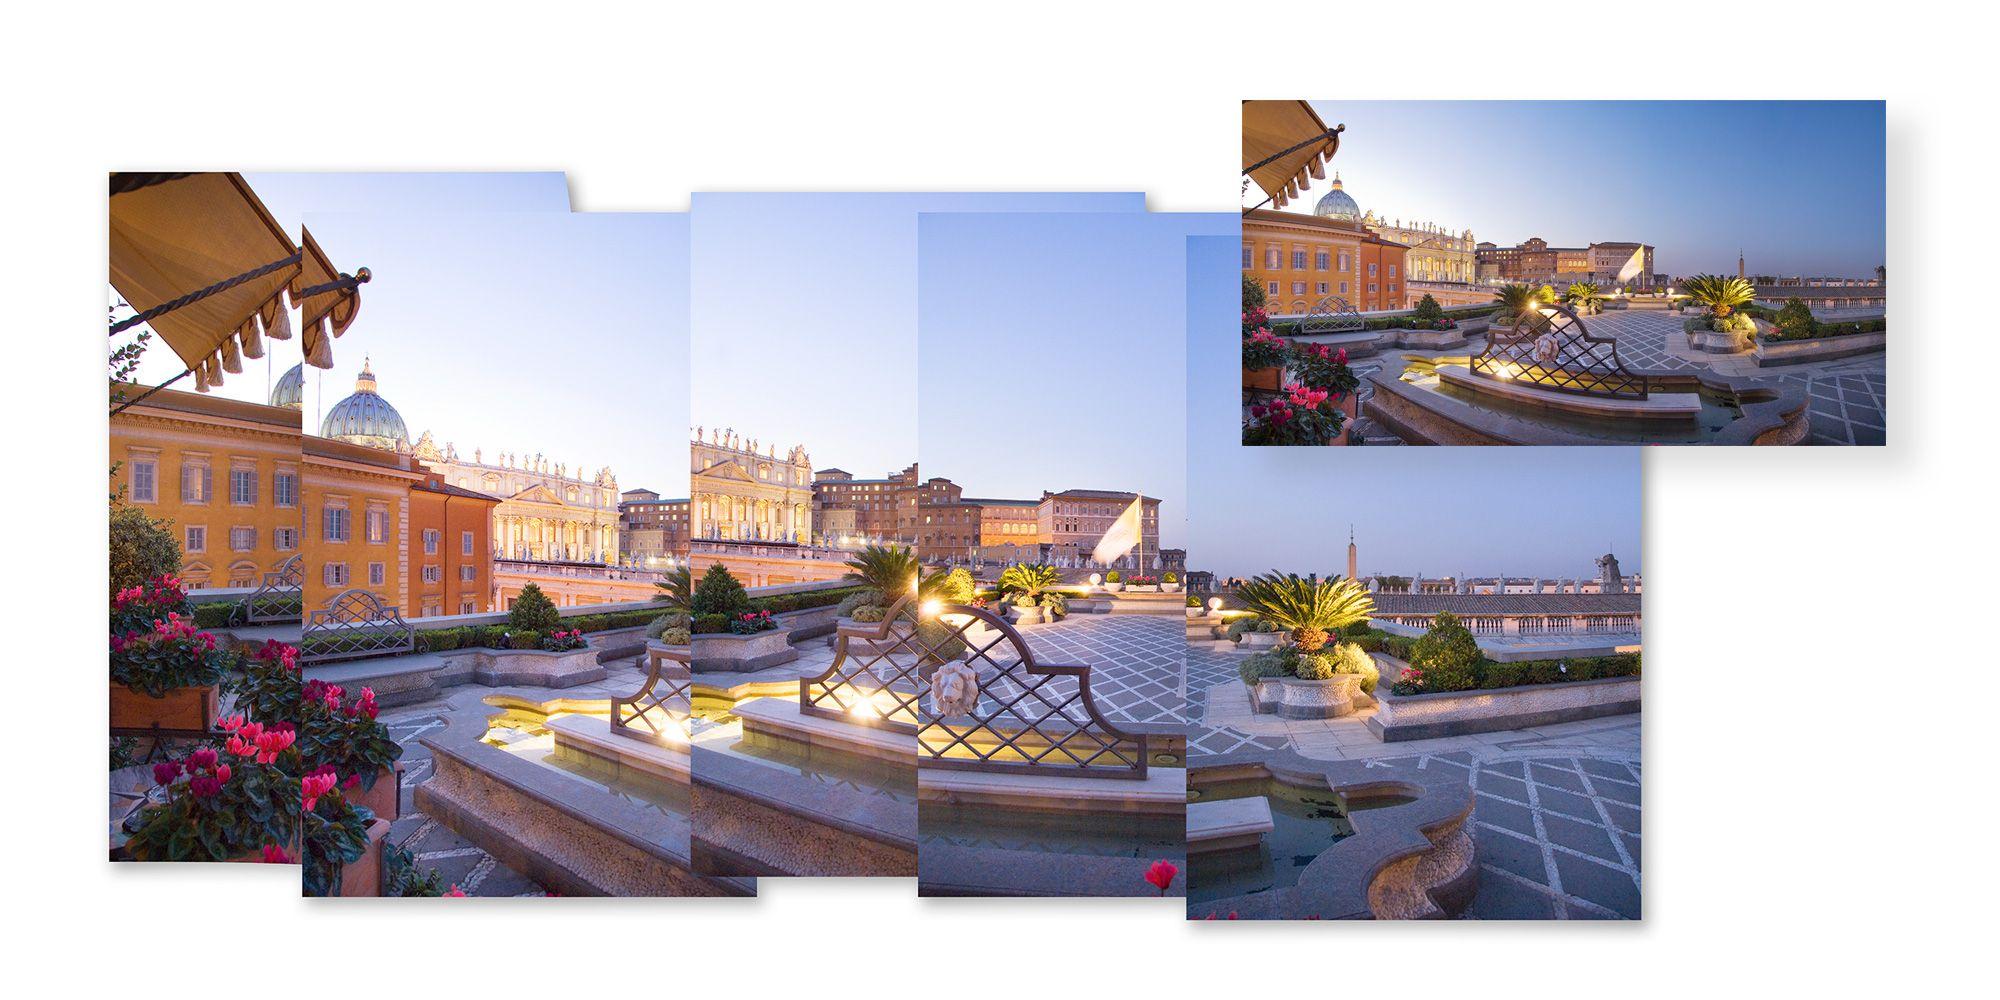 Rome_StPeters_composite.jpg